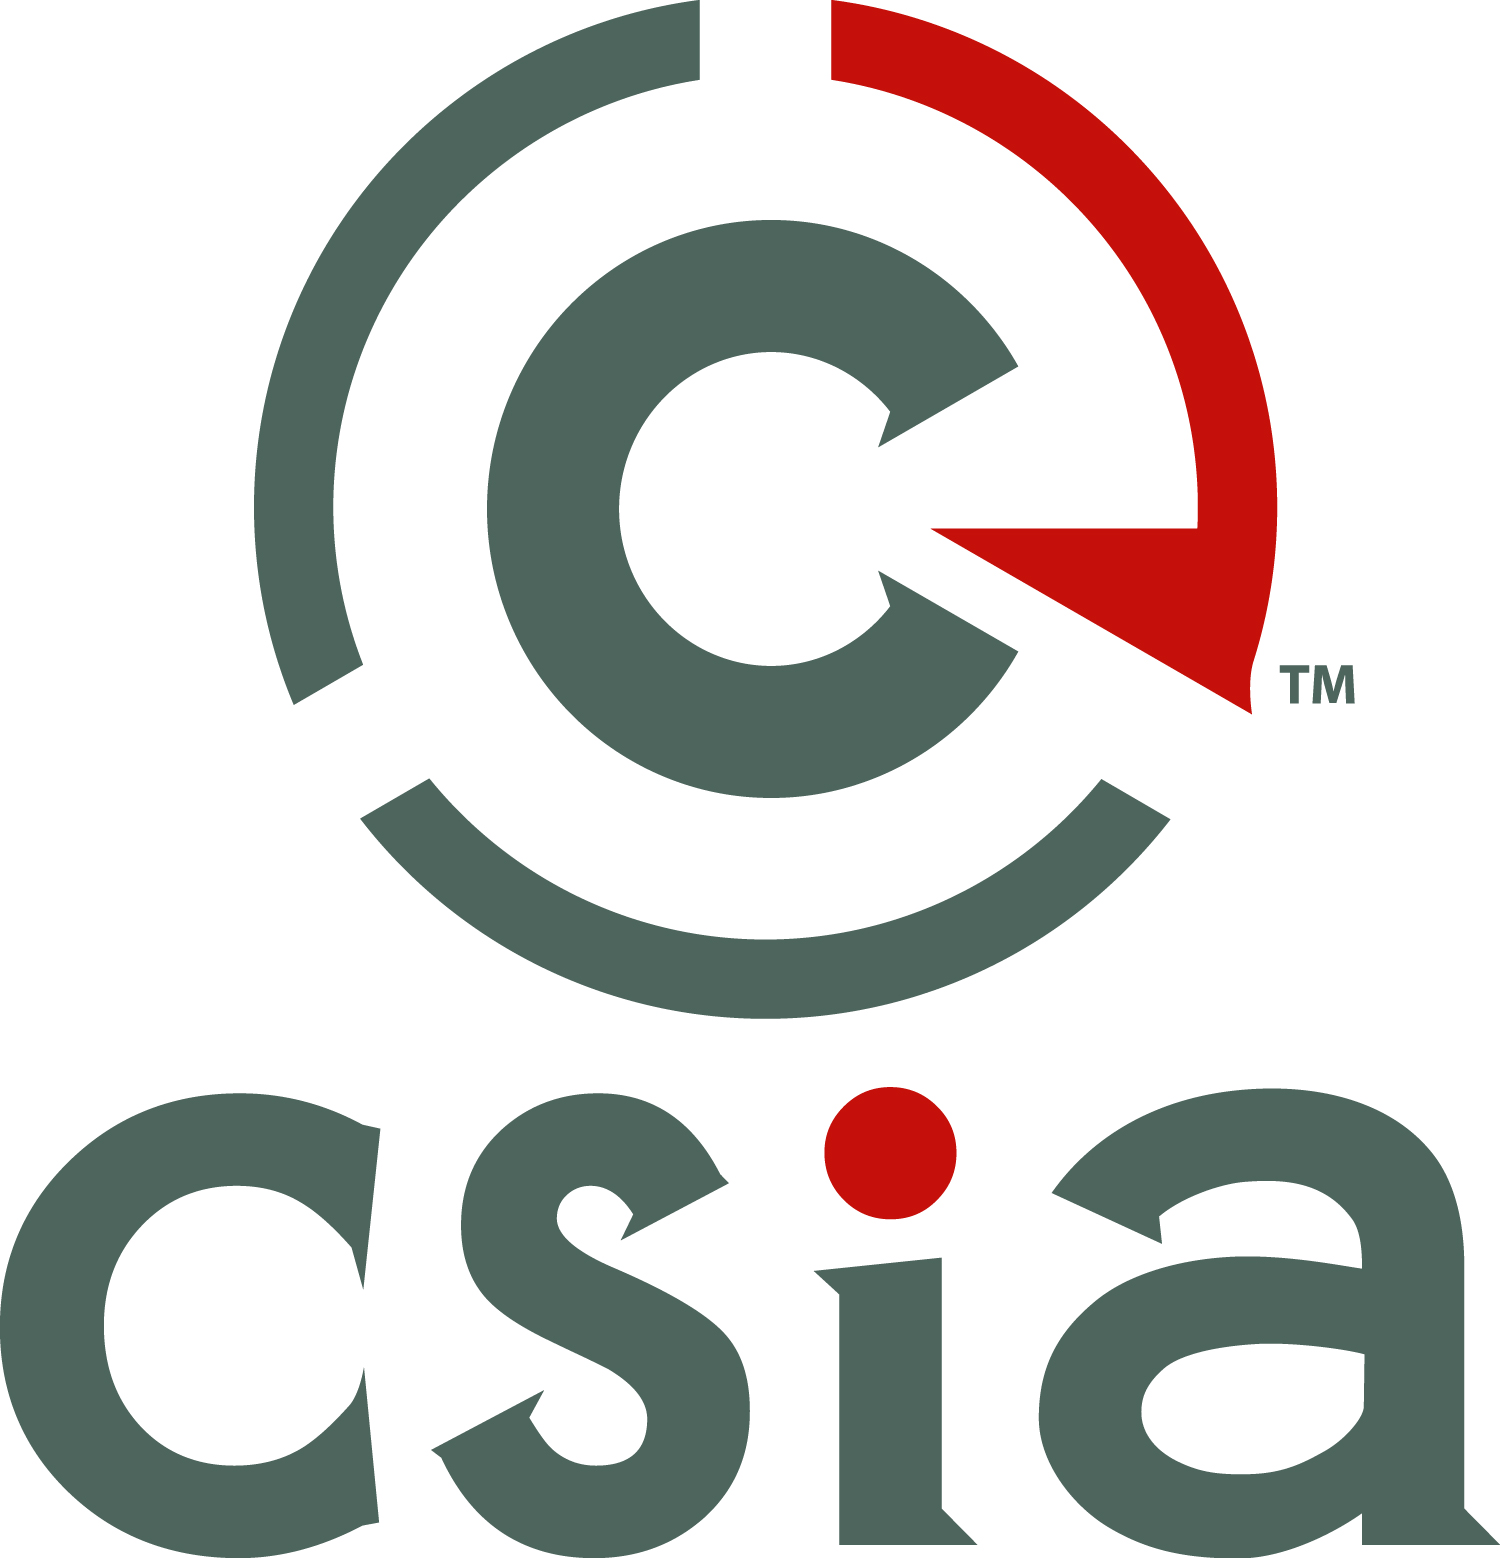 Control System Integrators Association